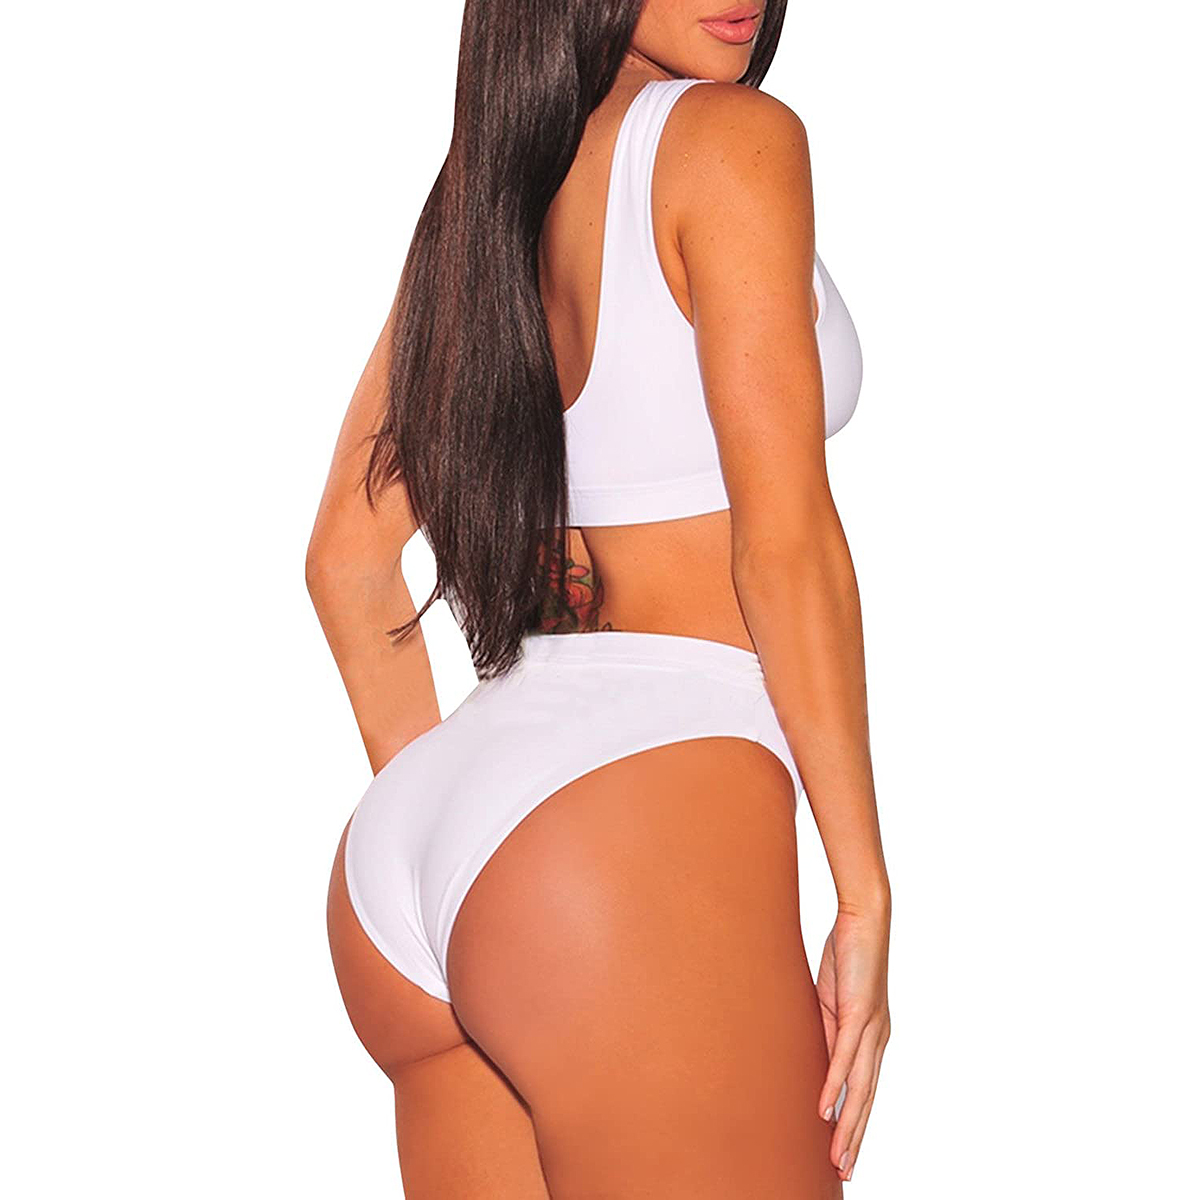 Selowin Tank Crop Top High-Waisted Cheeky Bikini Set